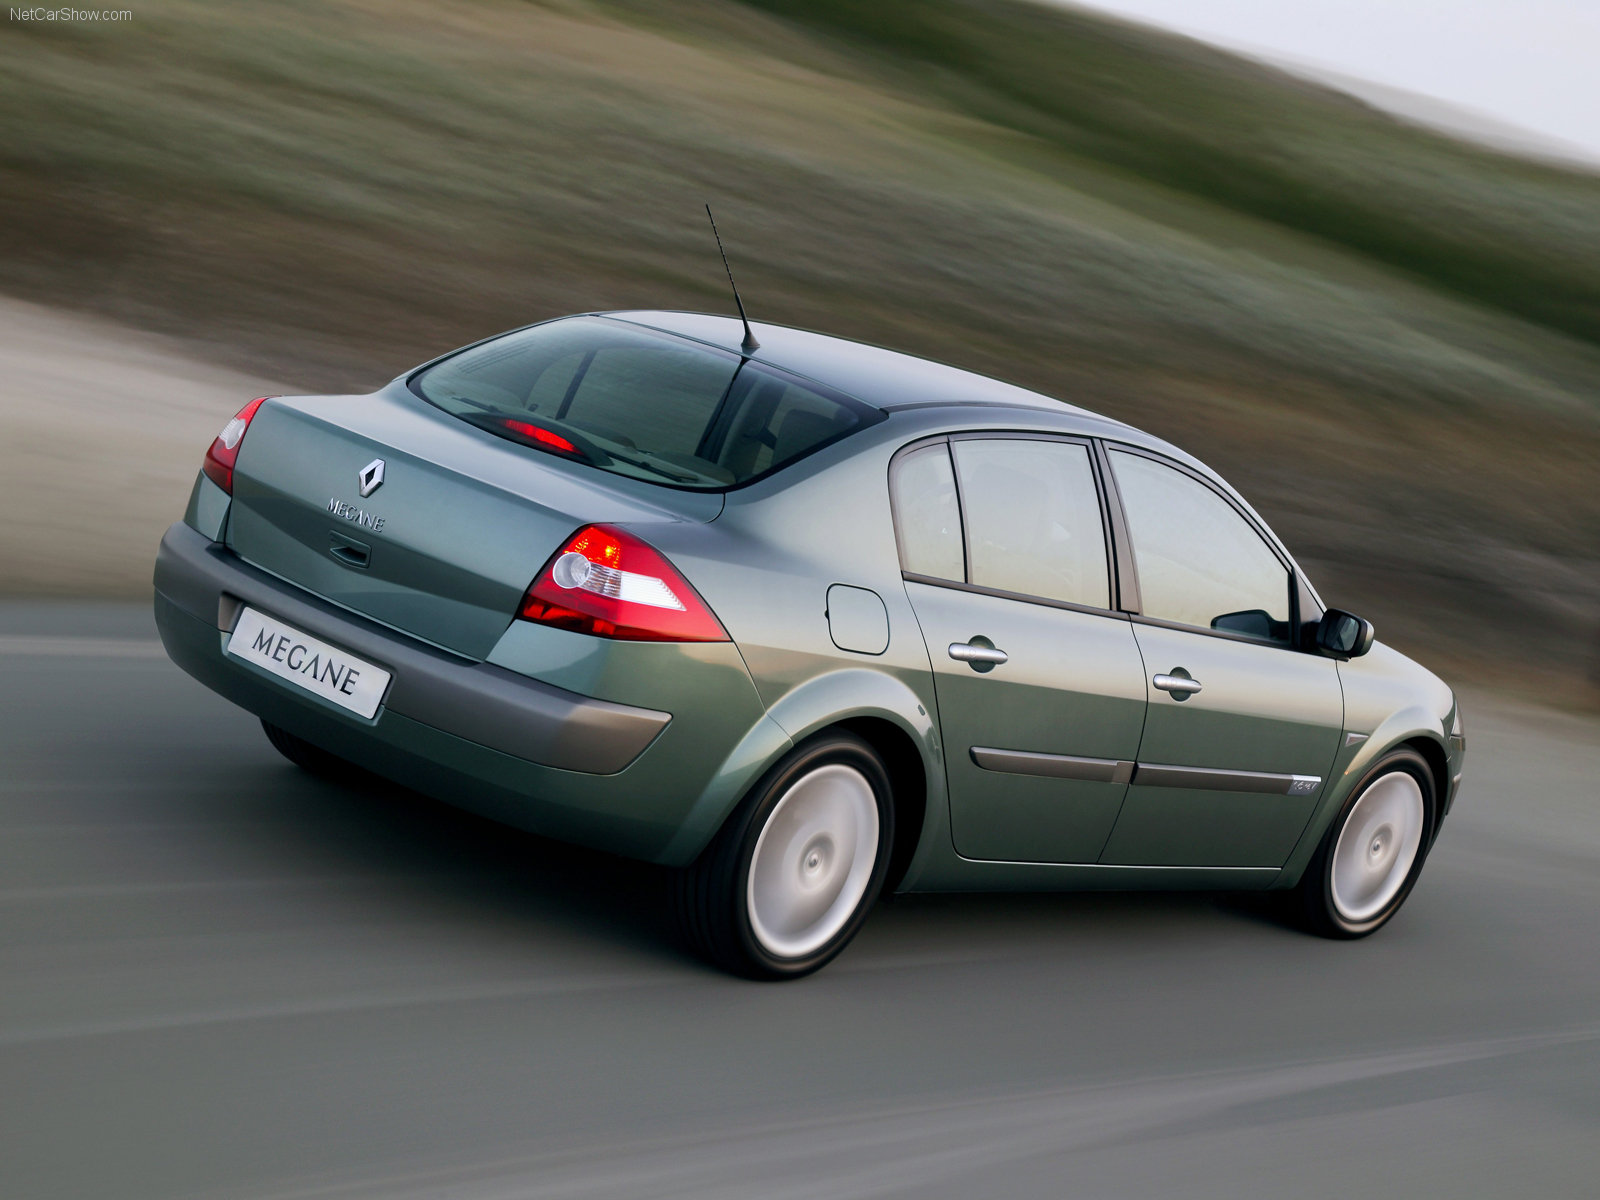 http://3.bp.blogspot.com/_OWAbzfVagFo/TNg0ZkL-mOI/AAAAAAAALP8/oyxnqkwNxRU/s1600/Renault-Megane_II_Saloon_2003_1600x1200_wallpaper_08.jpg